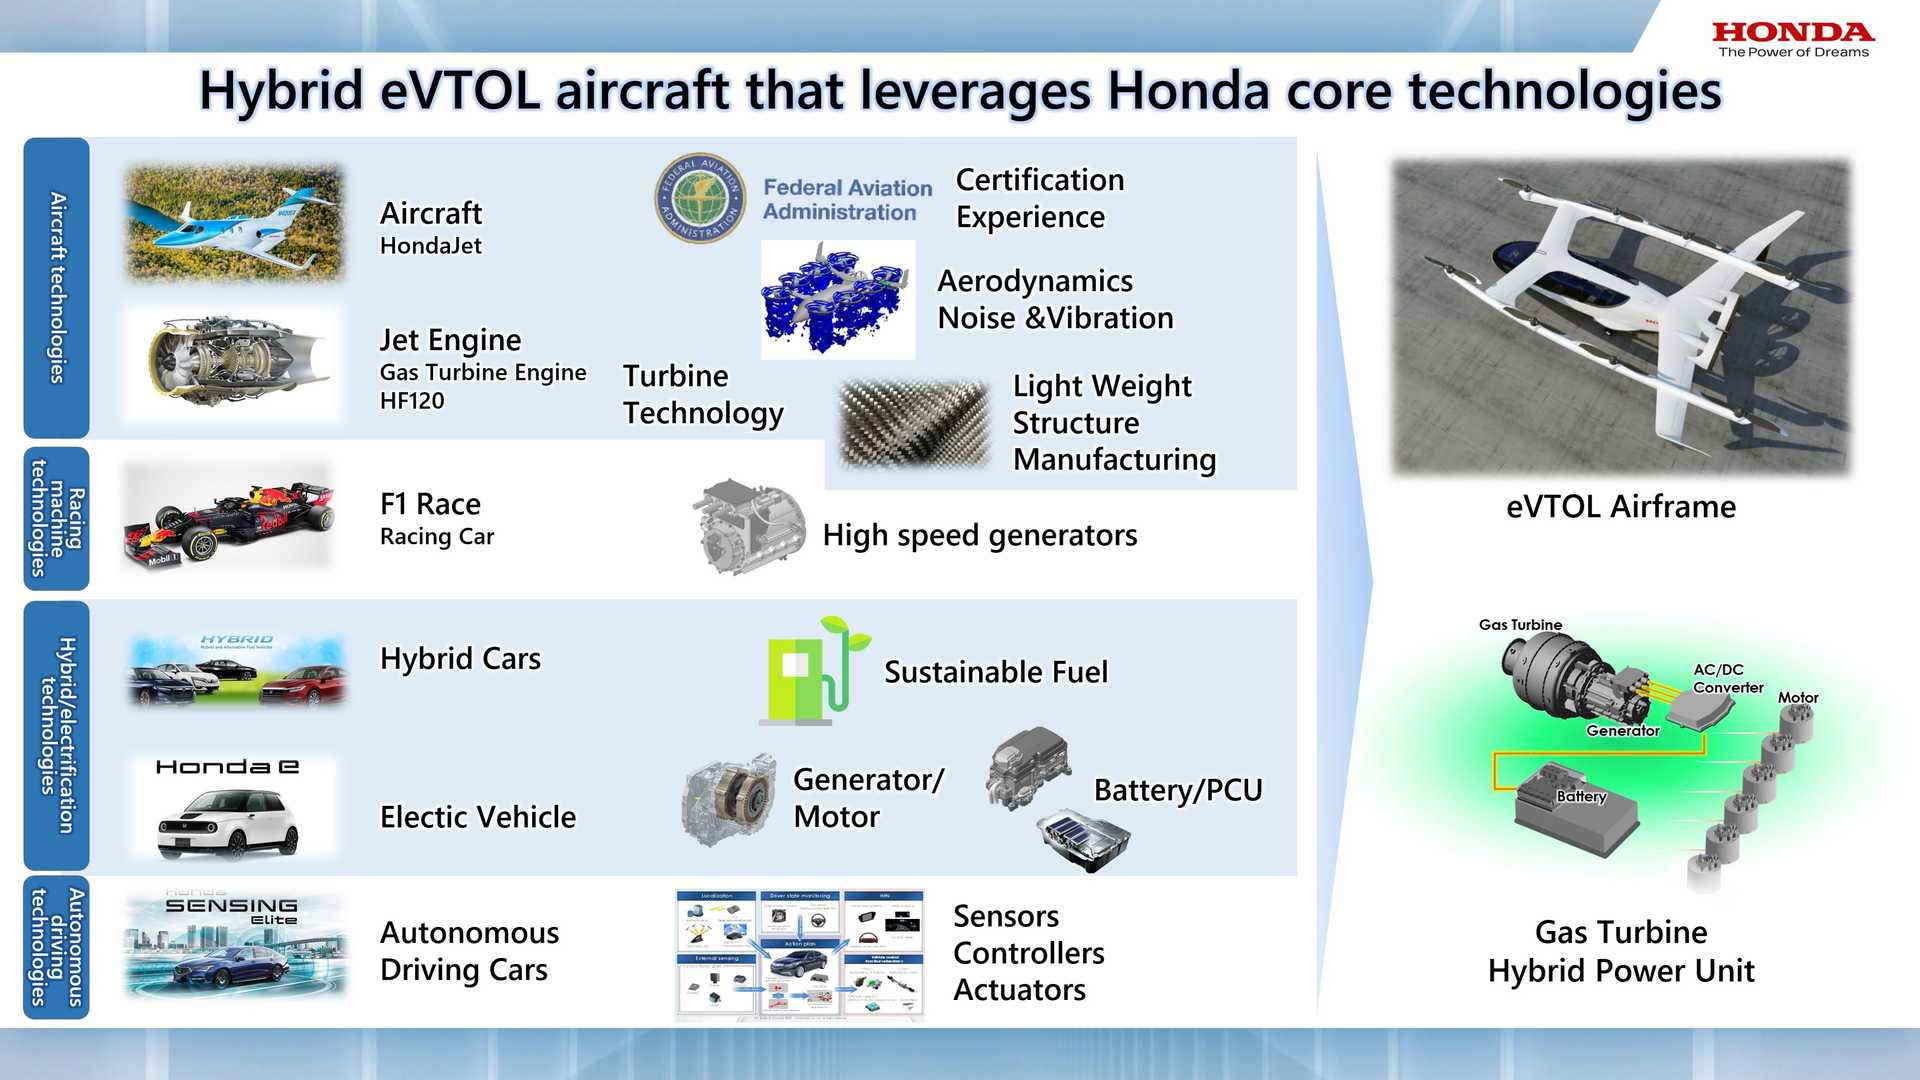 Honda-eVTOL-Hybrid-Mobility-Aircraft-6